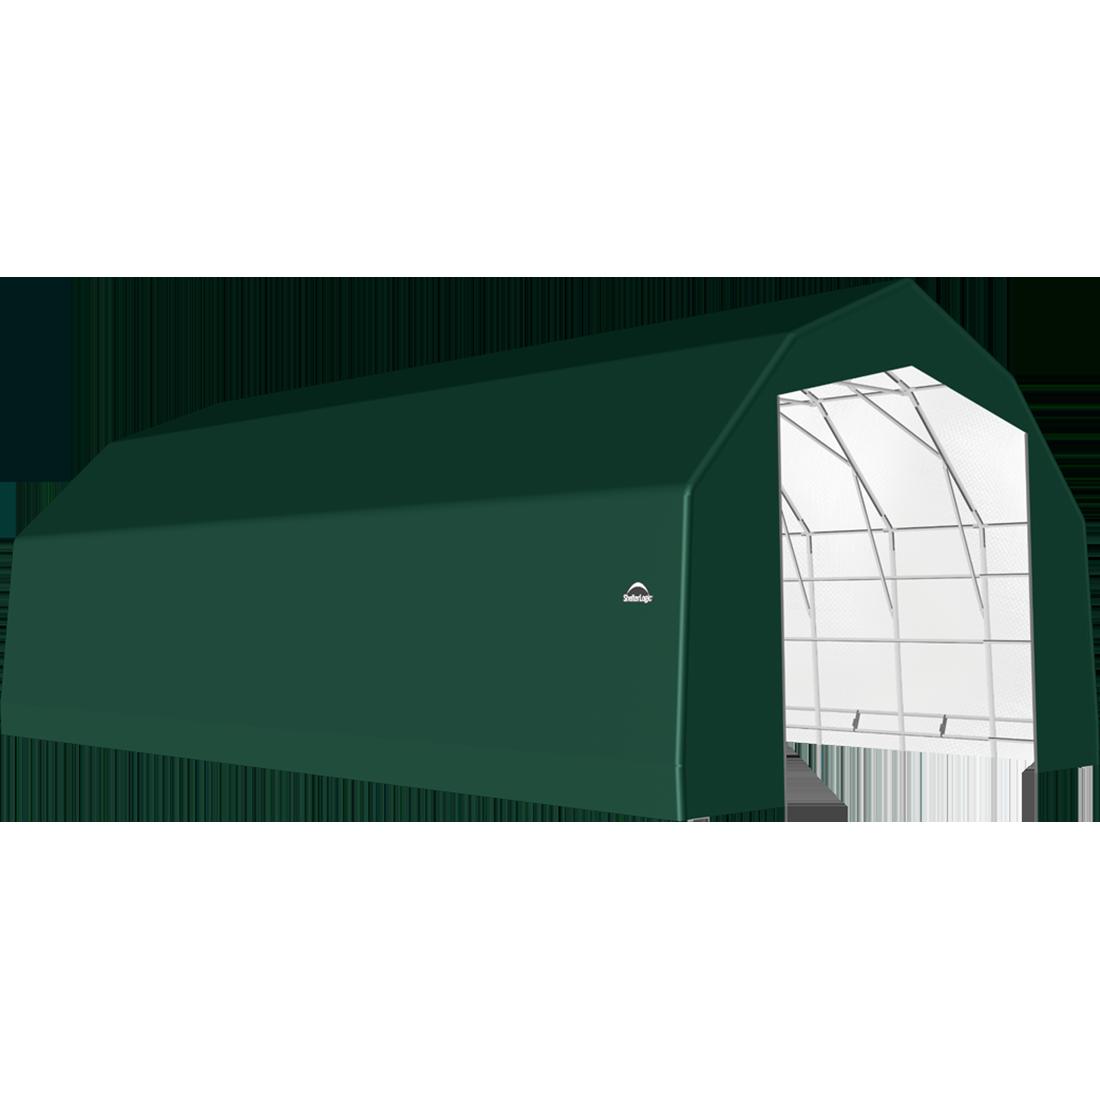 SP Barn 25X40X17 Green 14 oz PE Shelter